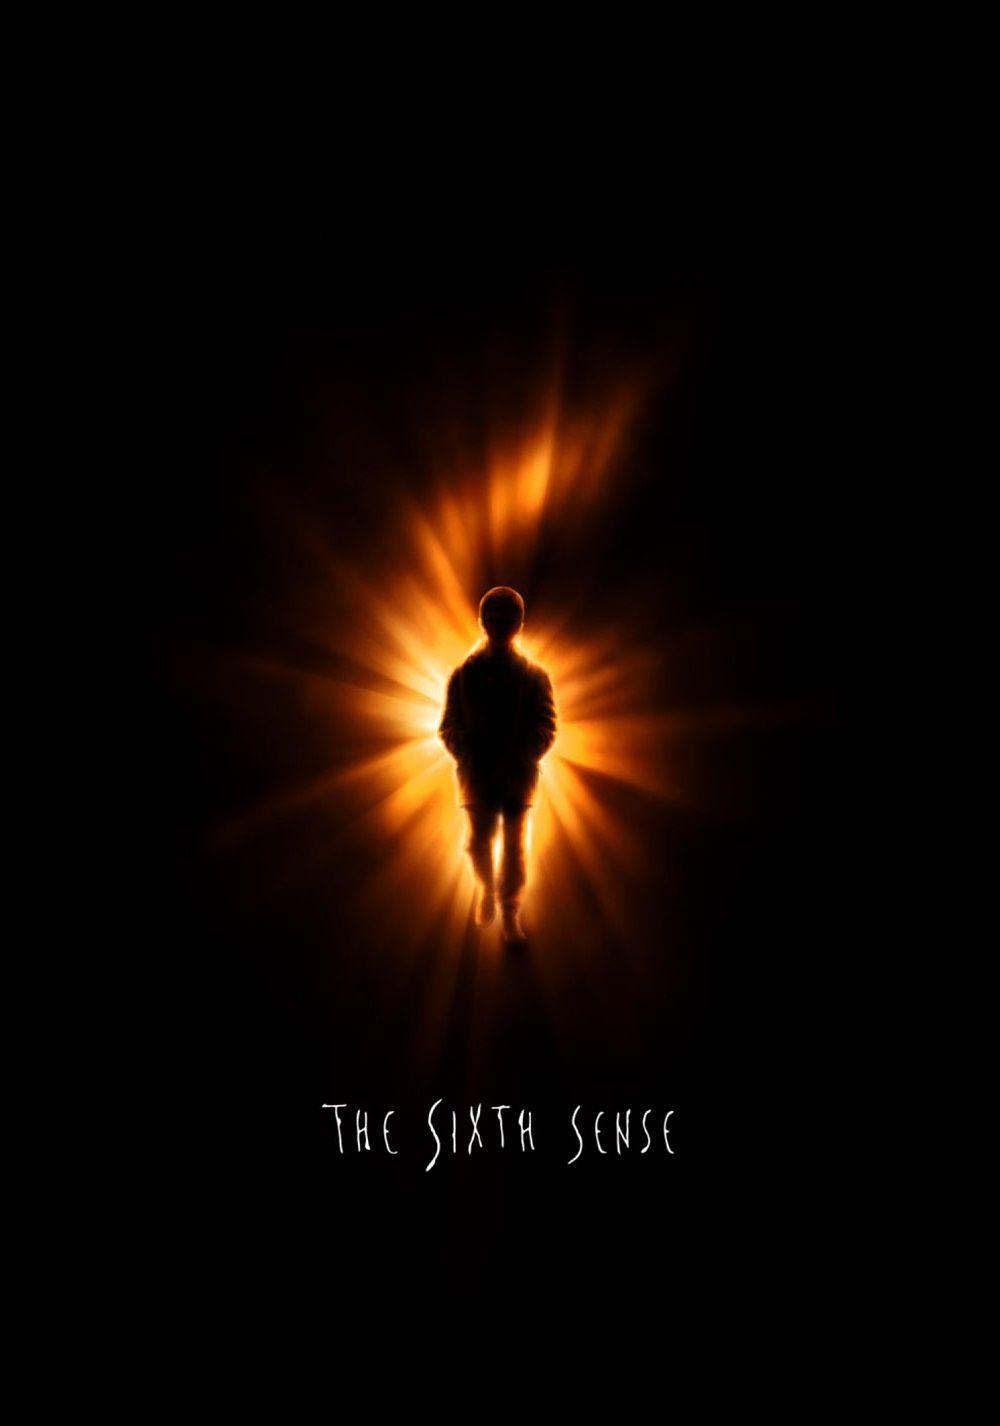 the sixth sense movie fanart fanarttv